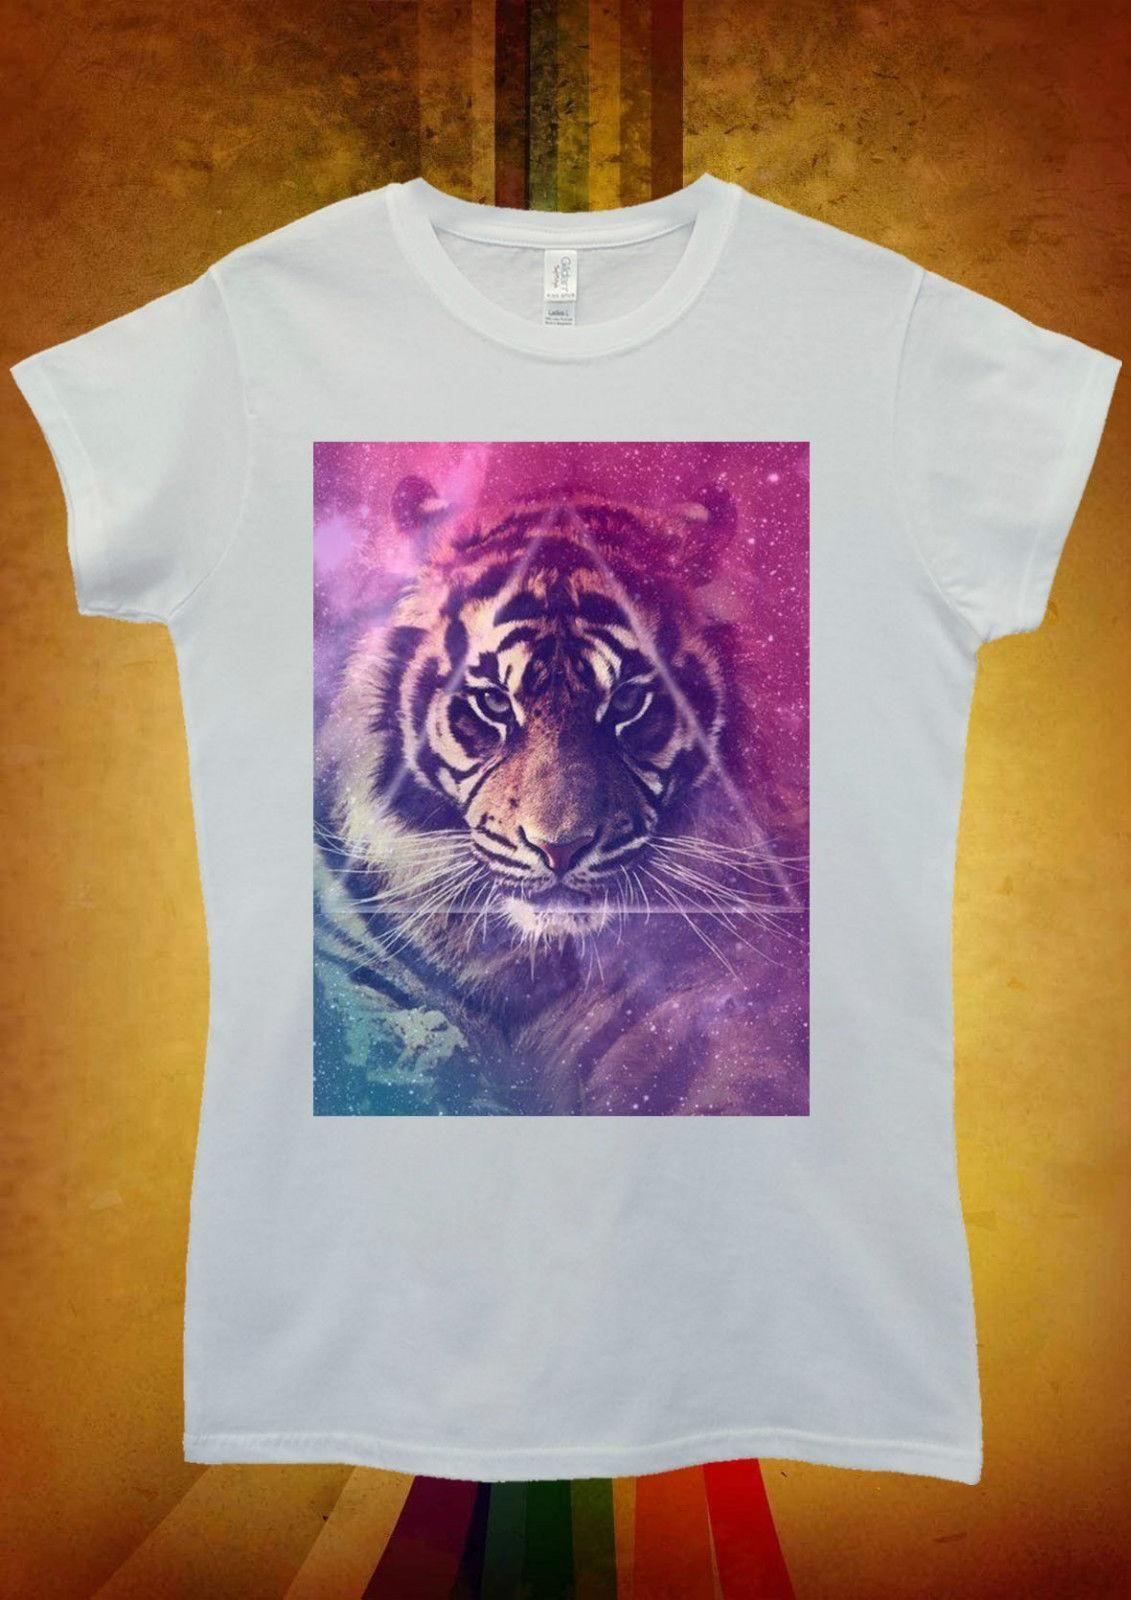 Großhandel Galaxy Tiger Tier Leopard Space Männer Frauen Unisex T Shirt Tank  Top Weste 540 Von Amesion2508,  12.08 Auf De.Dhgate.Com   Dhgate 7cc92570b3